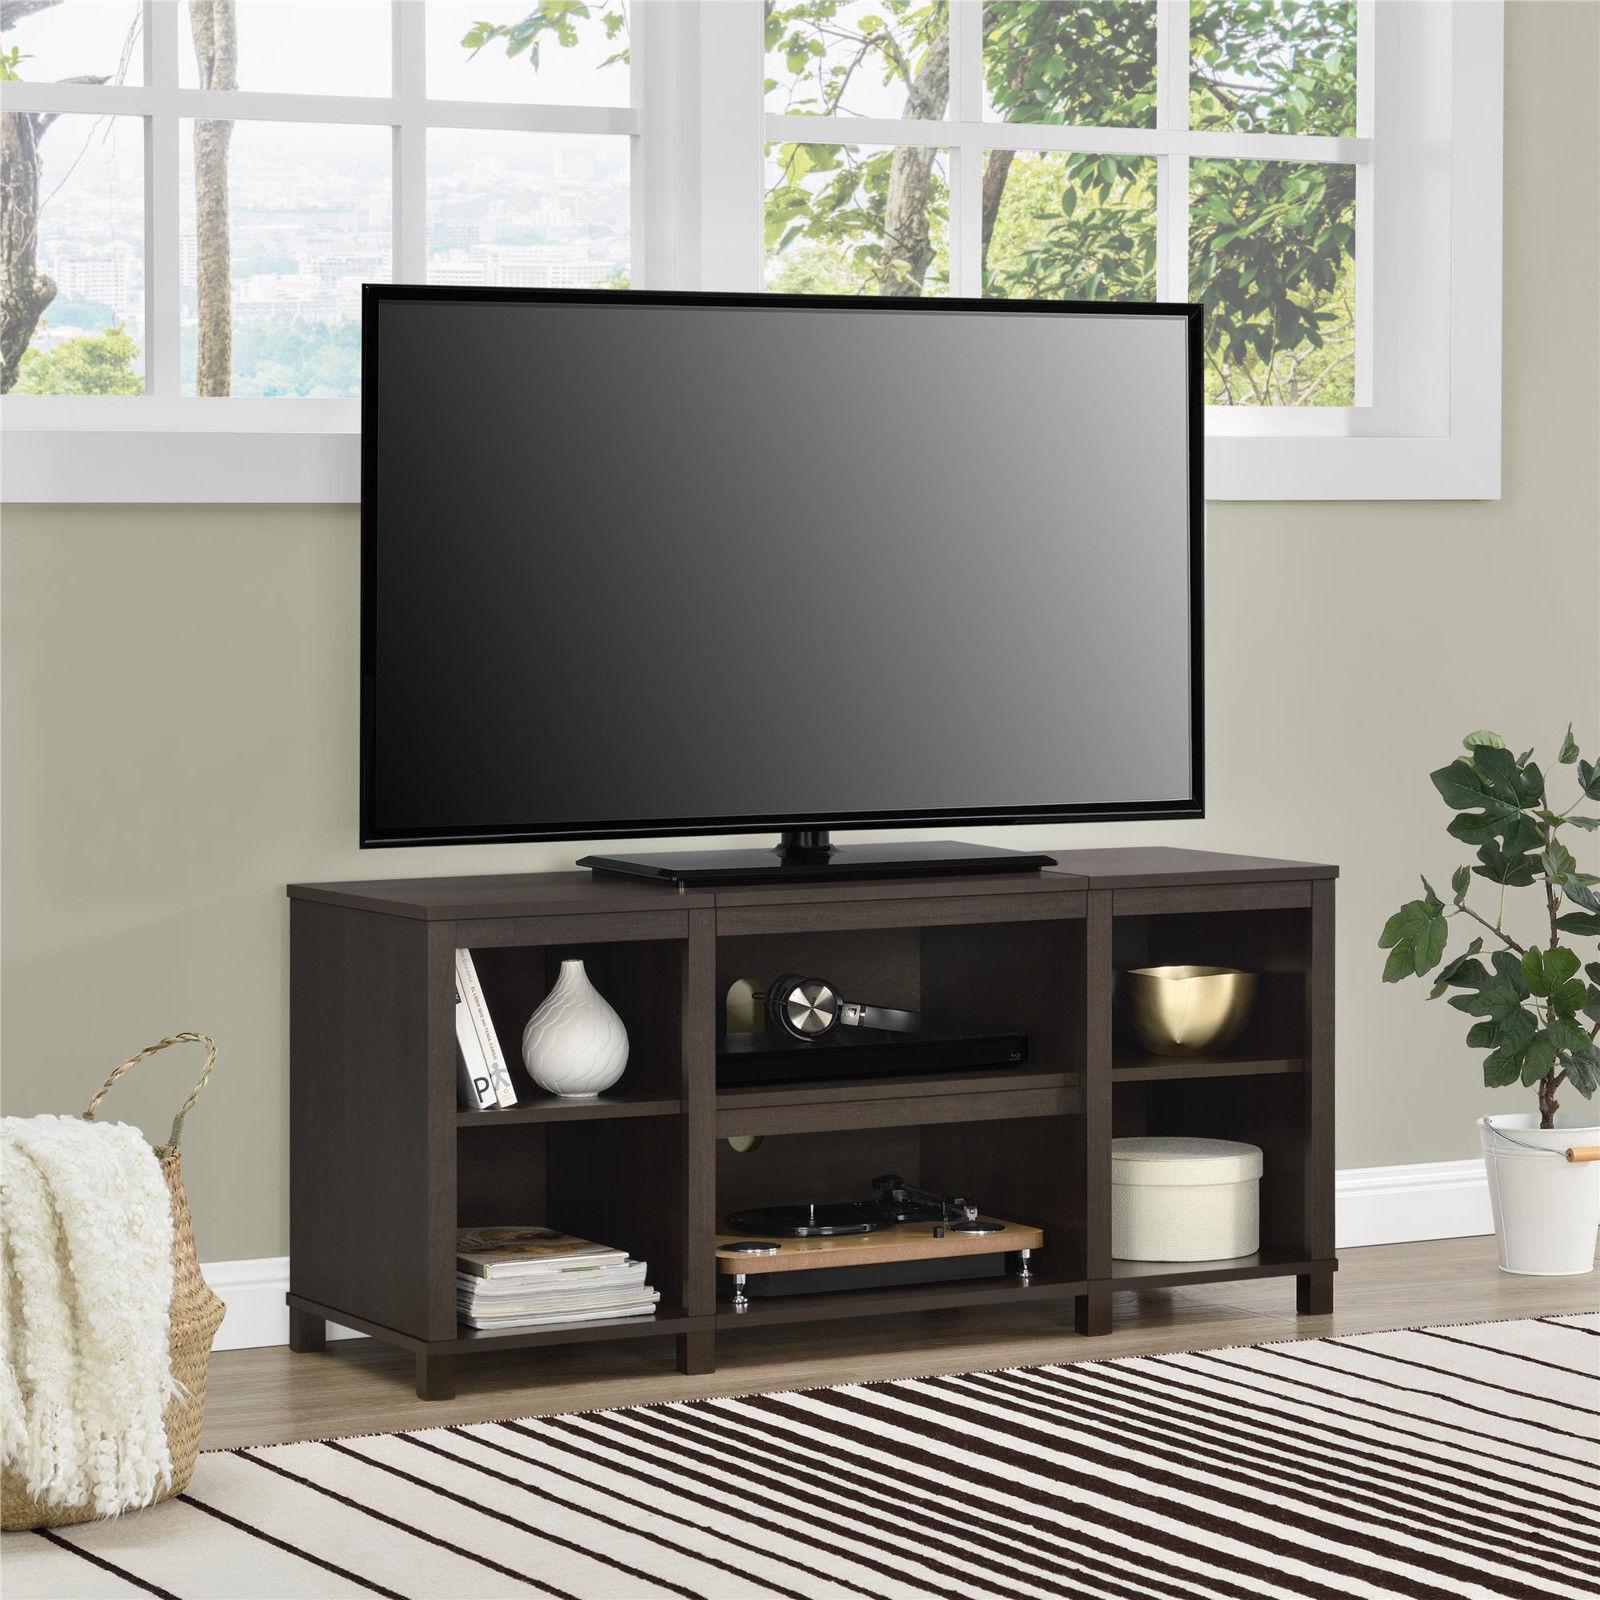 Tv Stand For 50 Inch Tv Media Center Storage Shelves Wood Fl